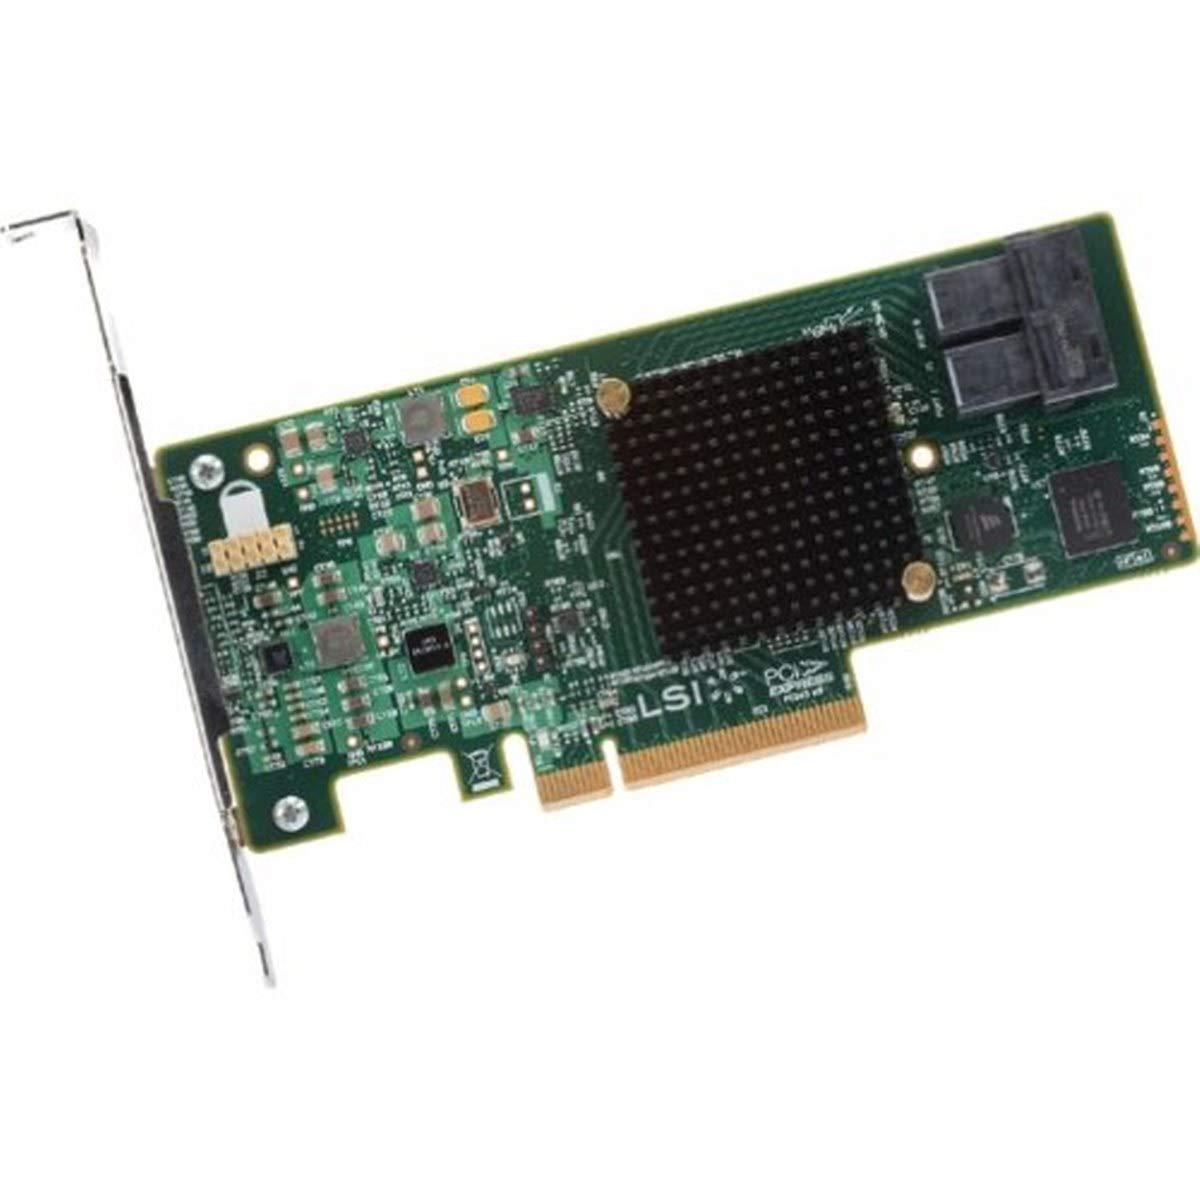 LSI Logic MegaRAID SAS 9341-8i SGL LSI00407 by LSI